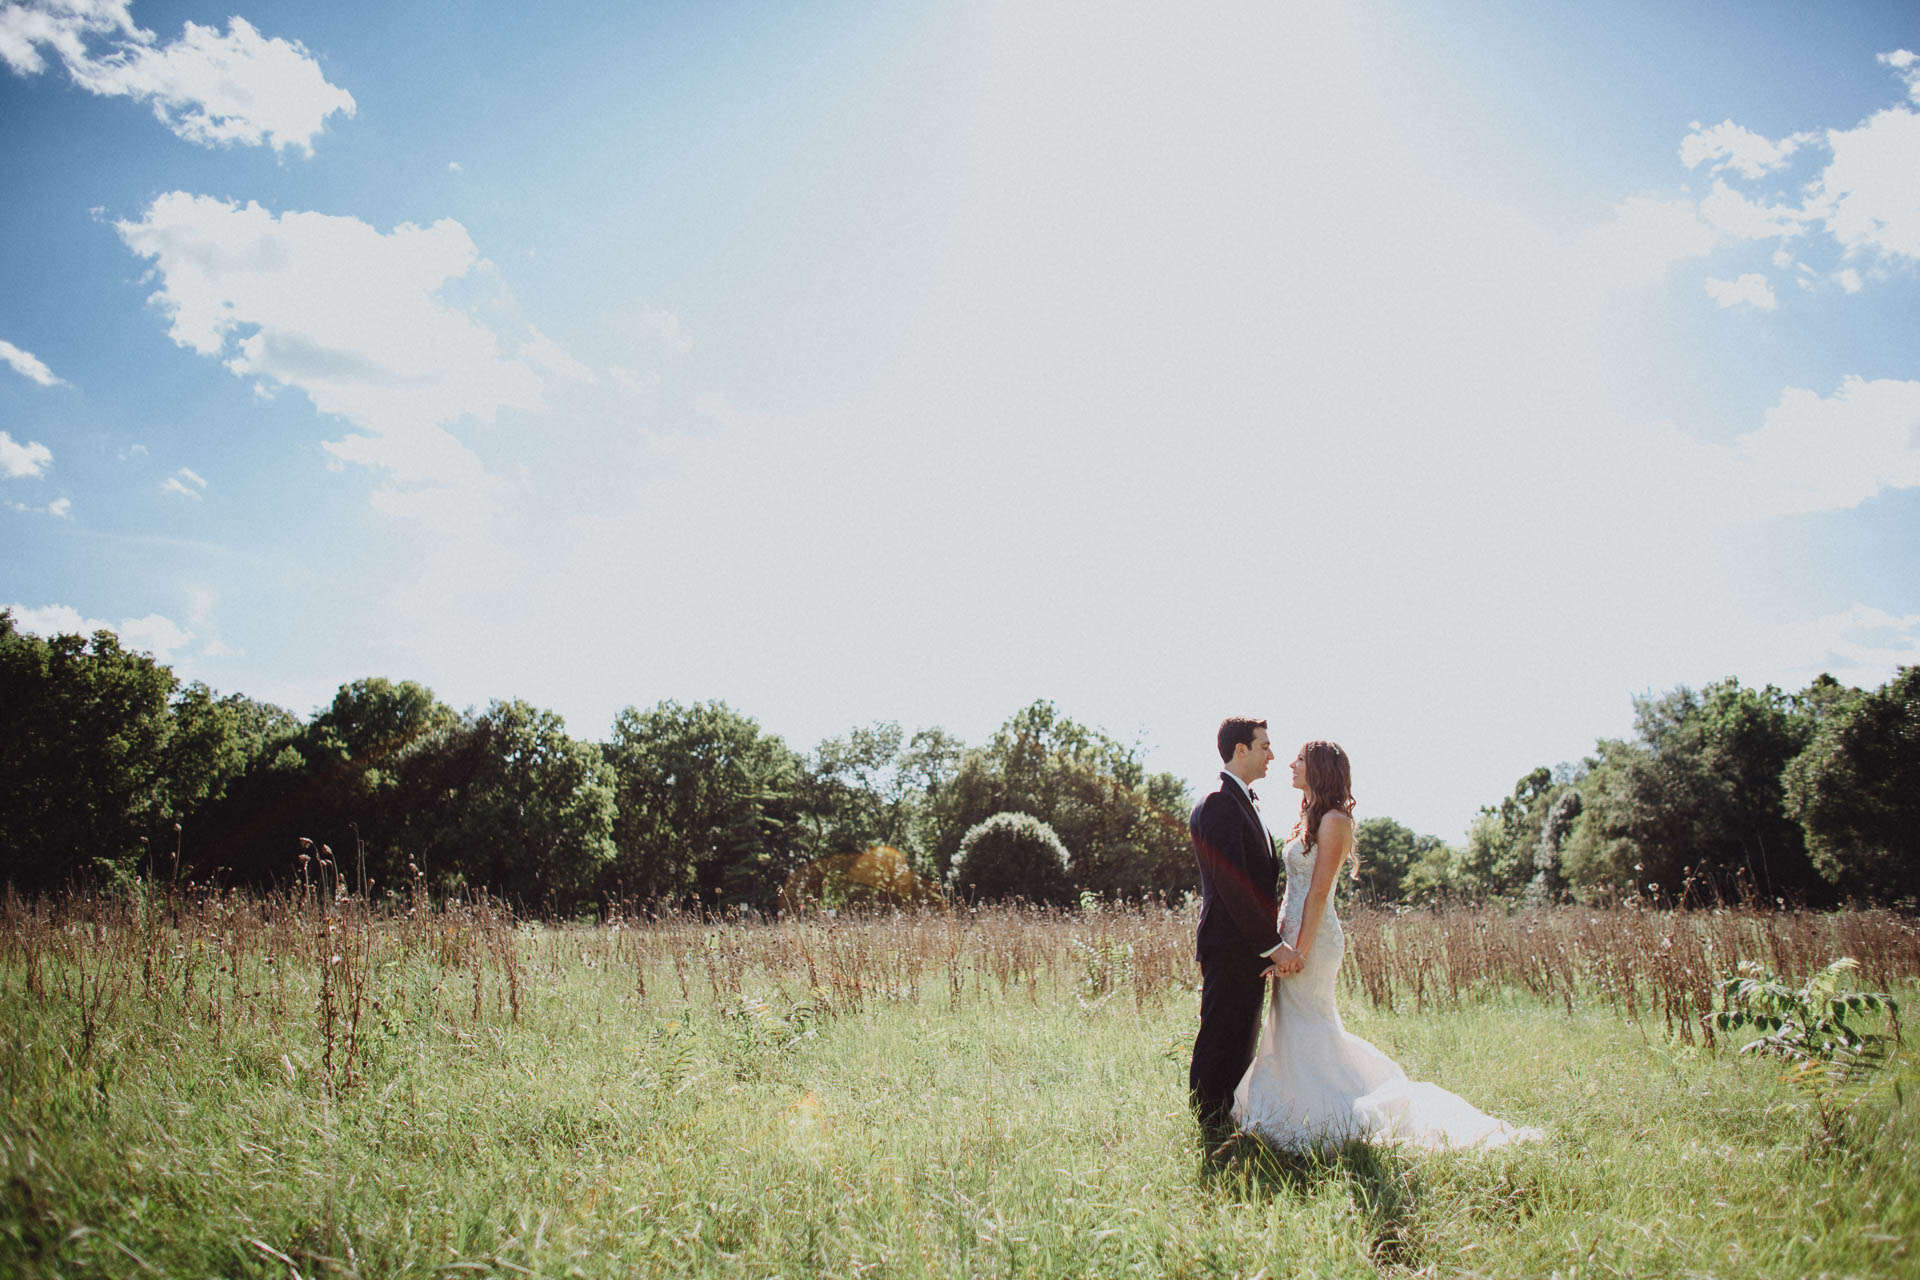 Keri-Joseph-Top-of-the-Market-Wedding-128@2x.jpg